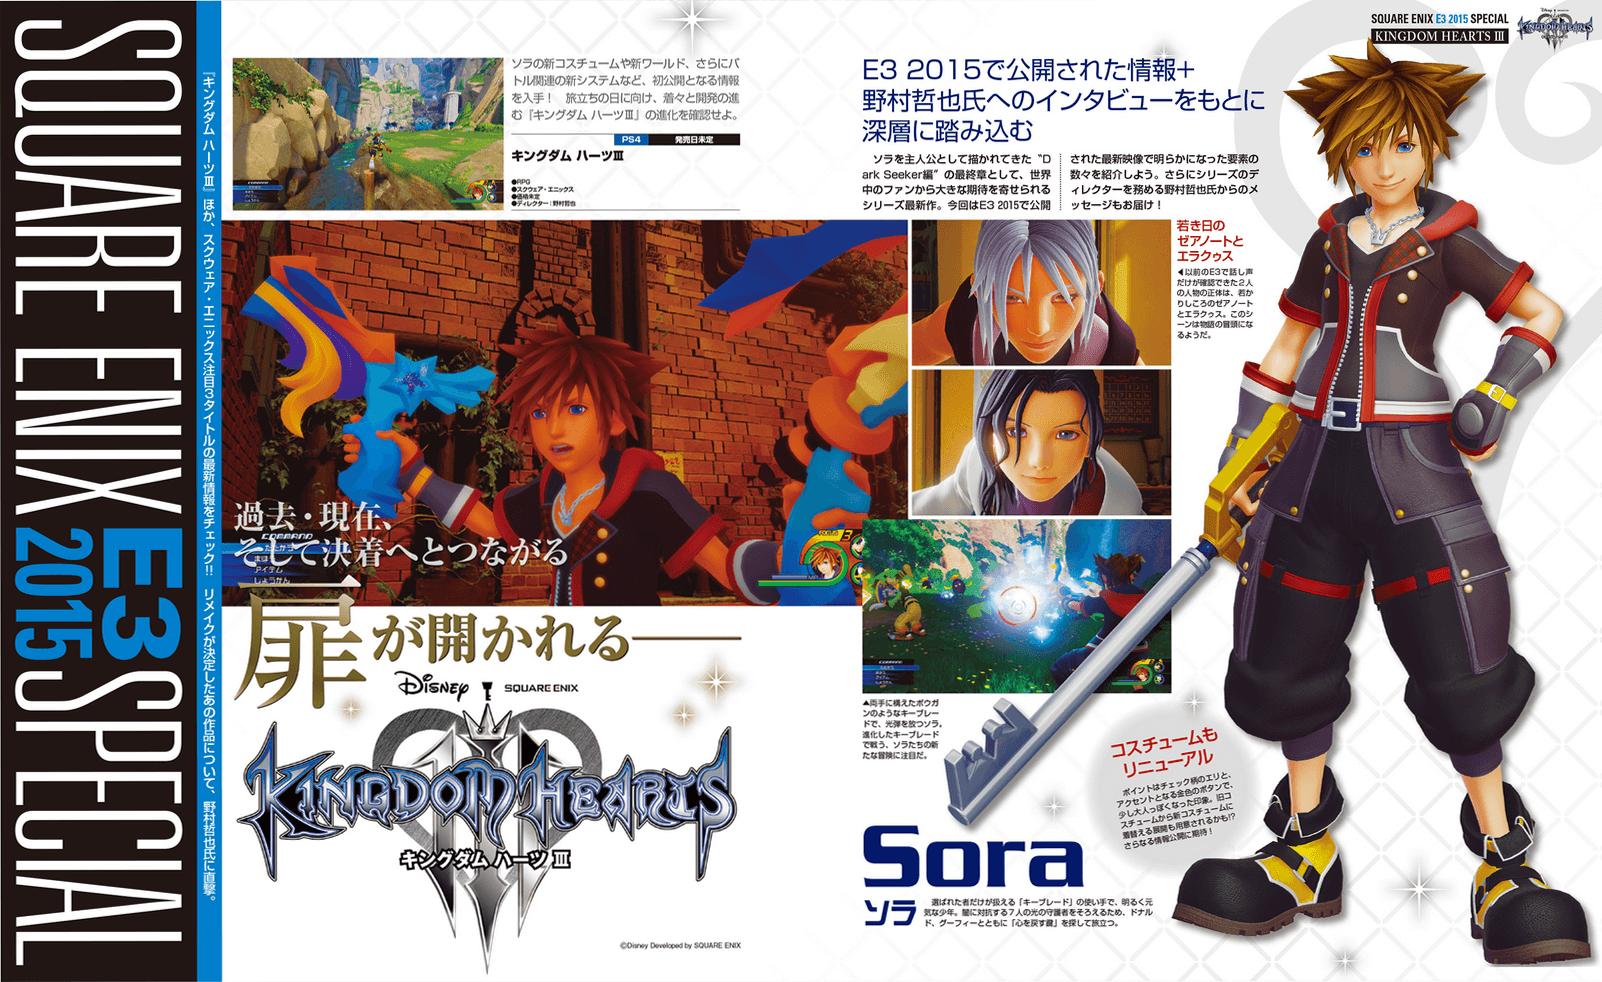 Kingdom Hearts 3 Dengeki PlayStation Scans